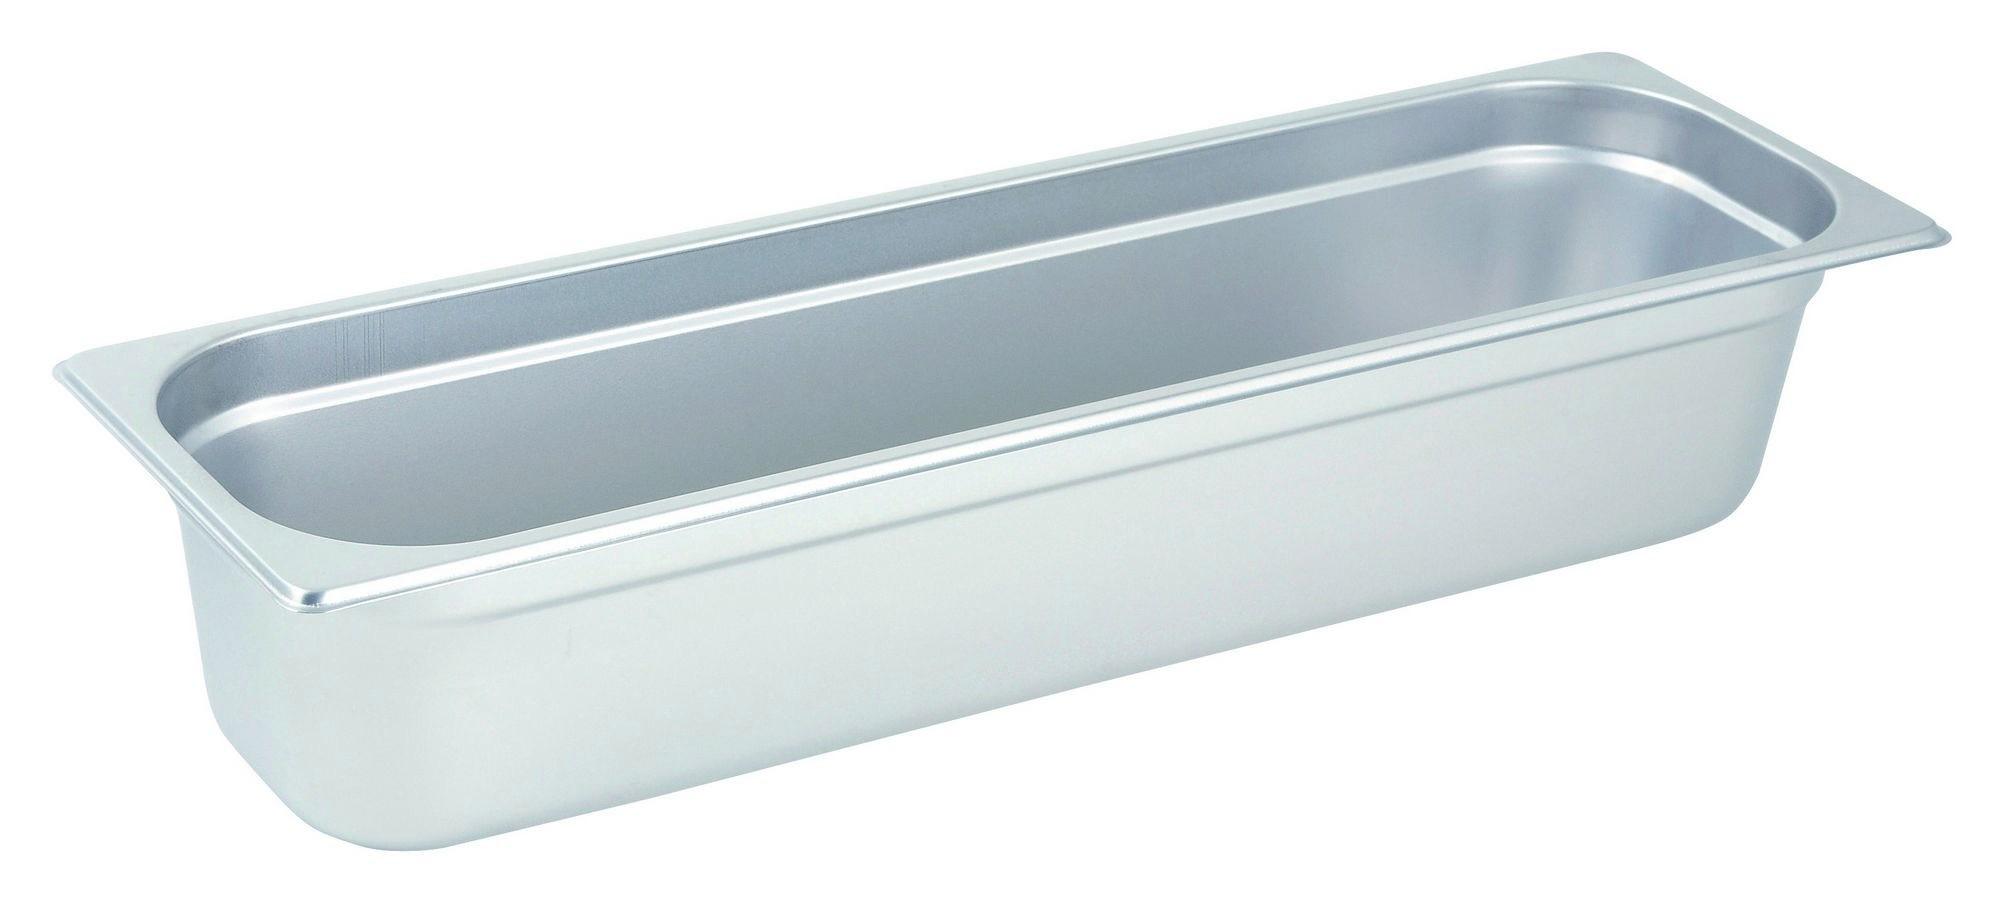 "Winco Spjl-4hl Half-Long Size Anti-Jam 25 Gauge Steam Table Pan 4"" Deep"